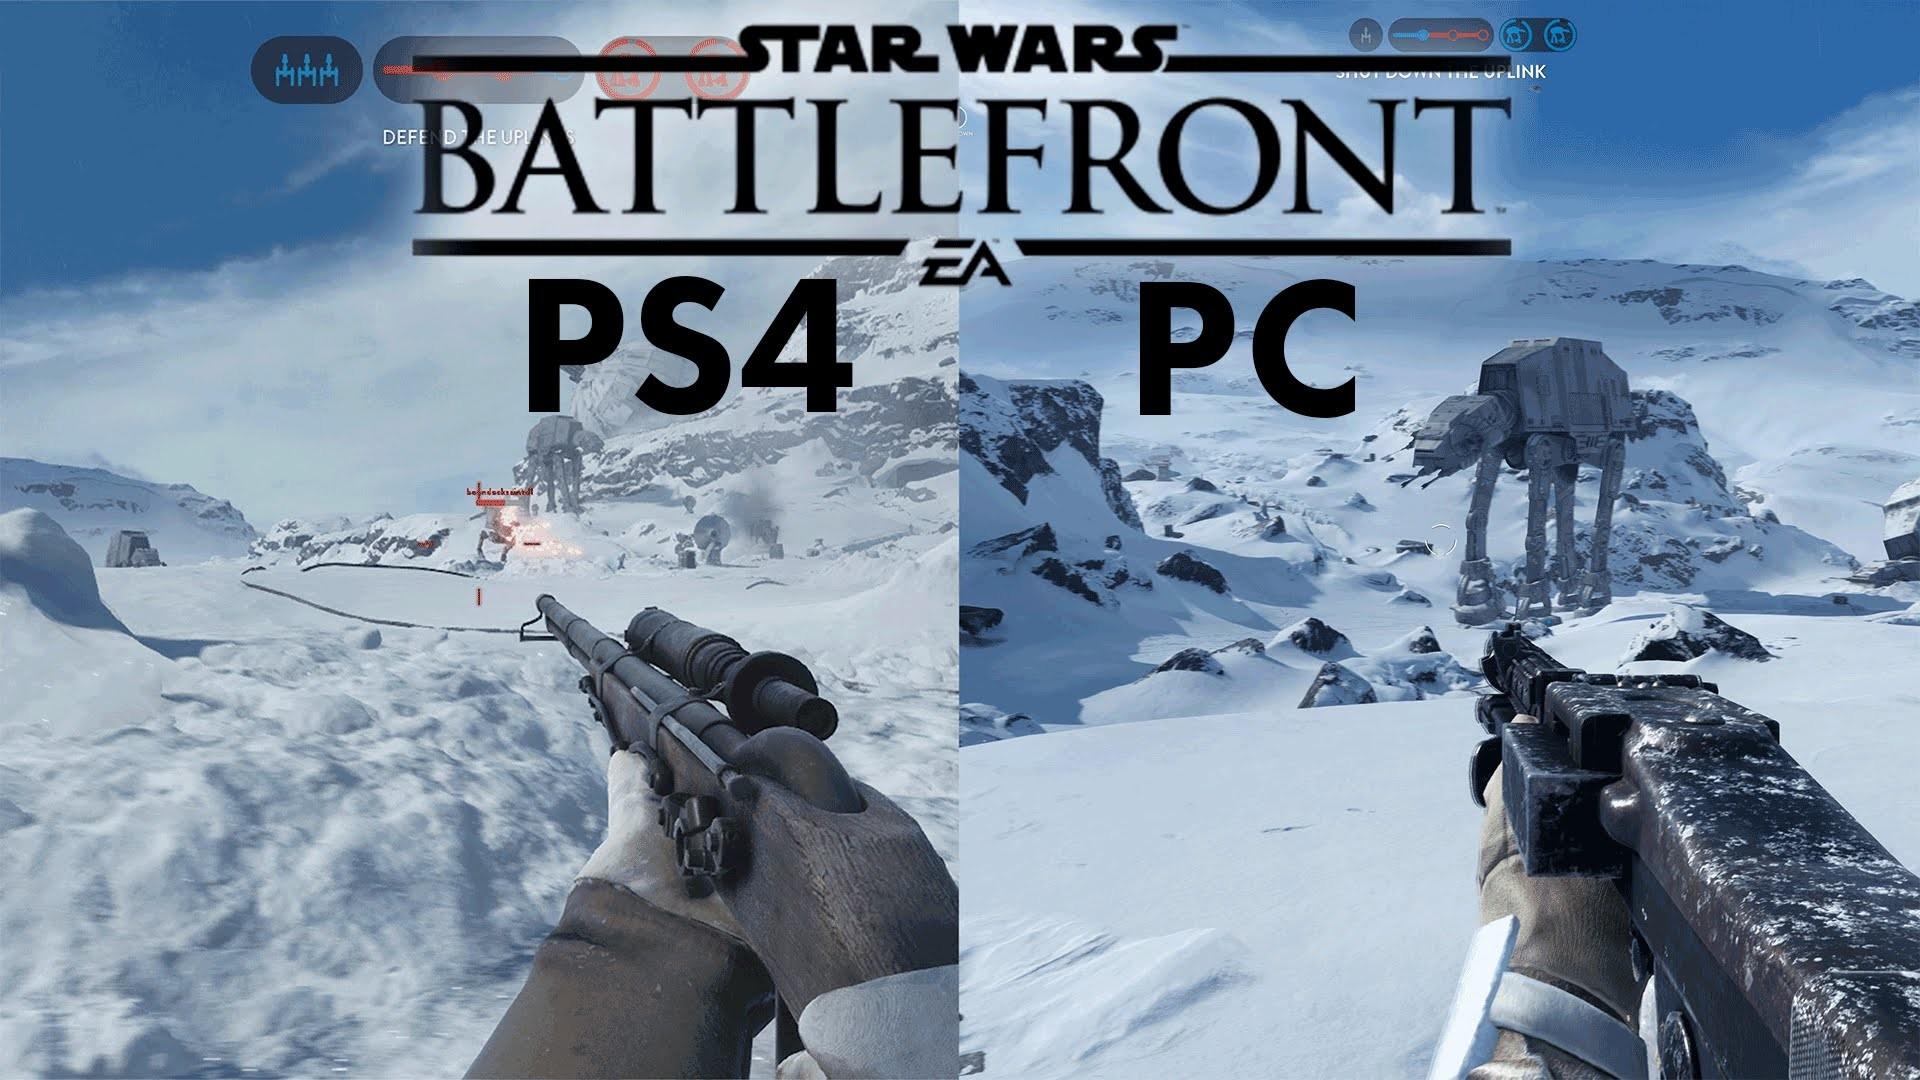 Star Wars Battlefront BETA | PC vs PS4 | 4k vs 1080p ULTRA Gameplay  Comparison – YouTube